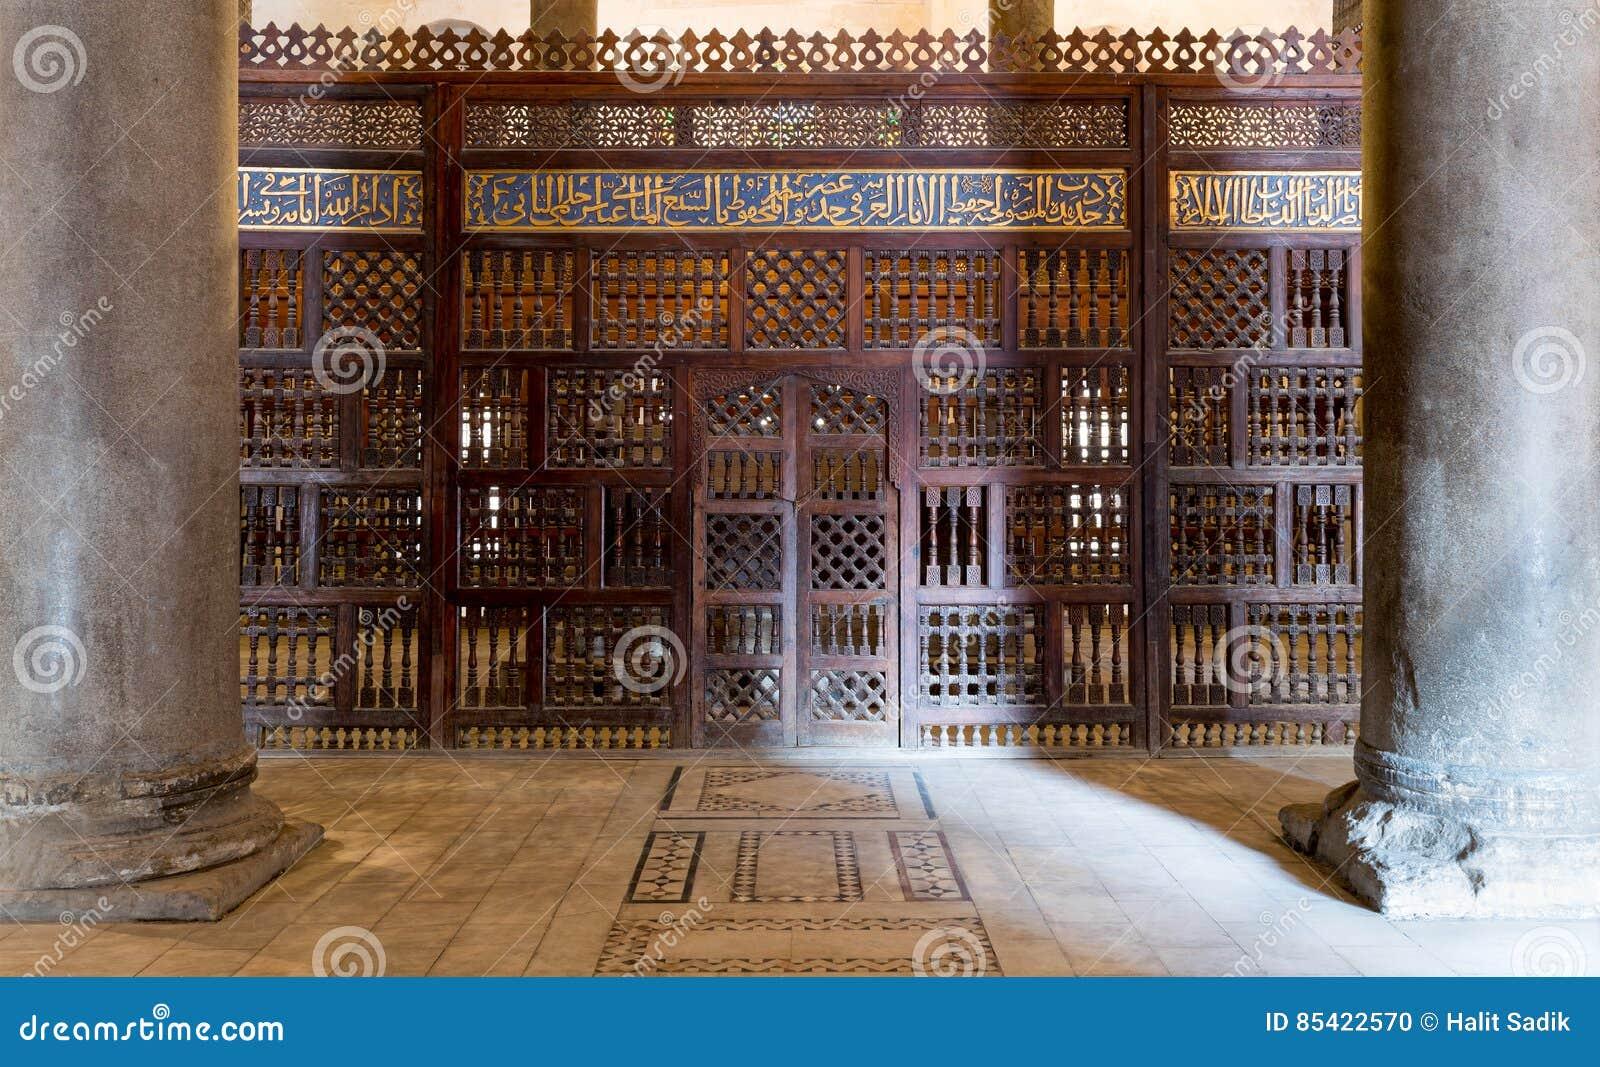 Inre mausoleet av Sultan Qalawun, gammal Kairo, Egypten